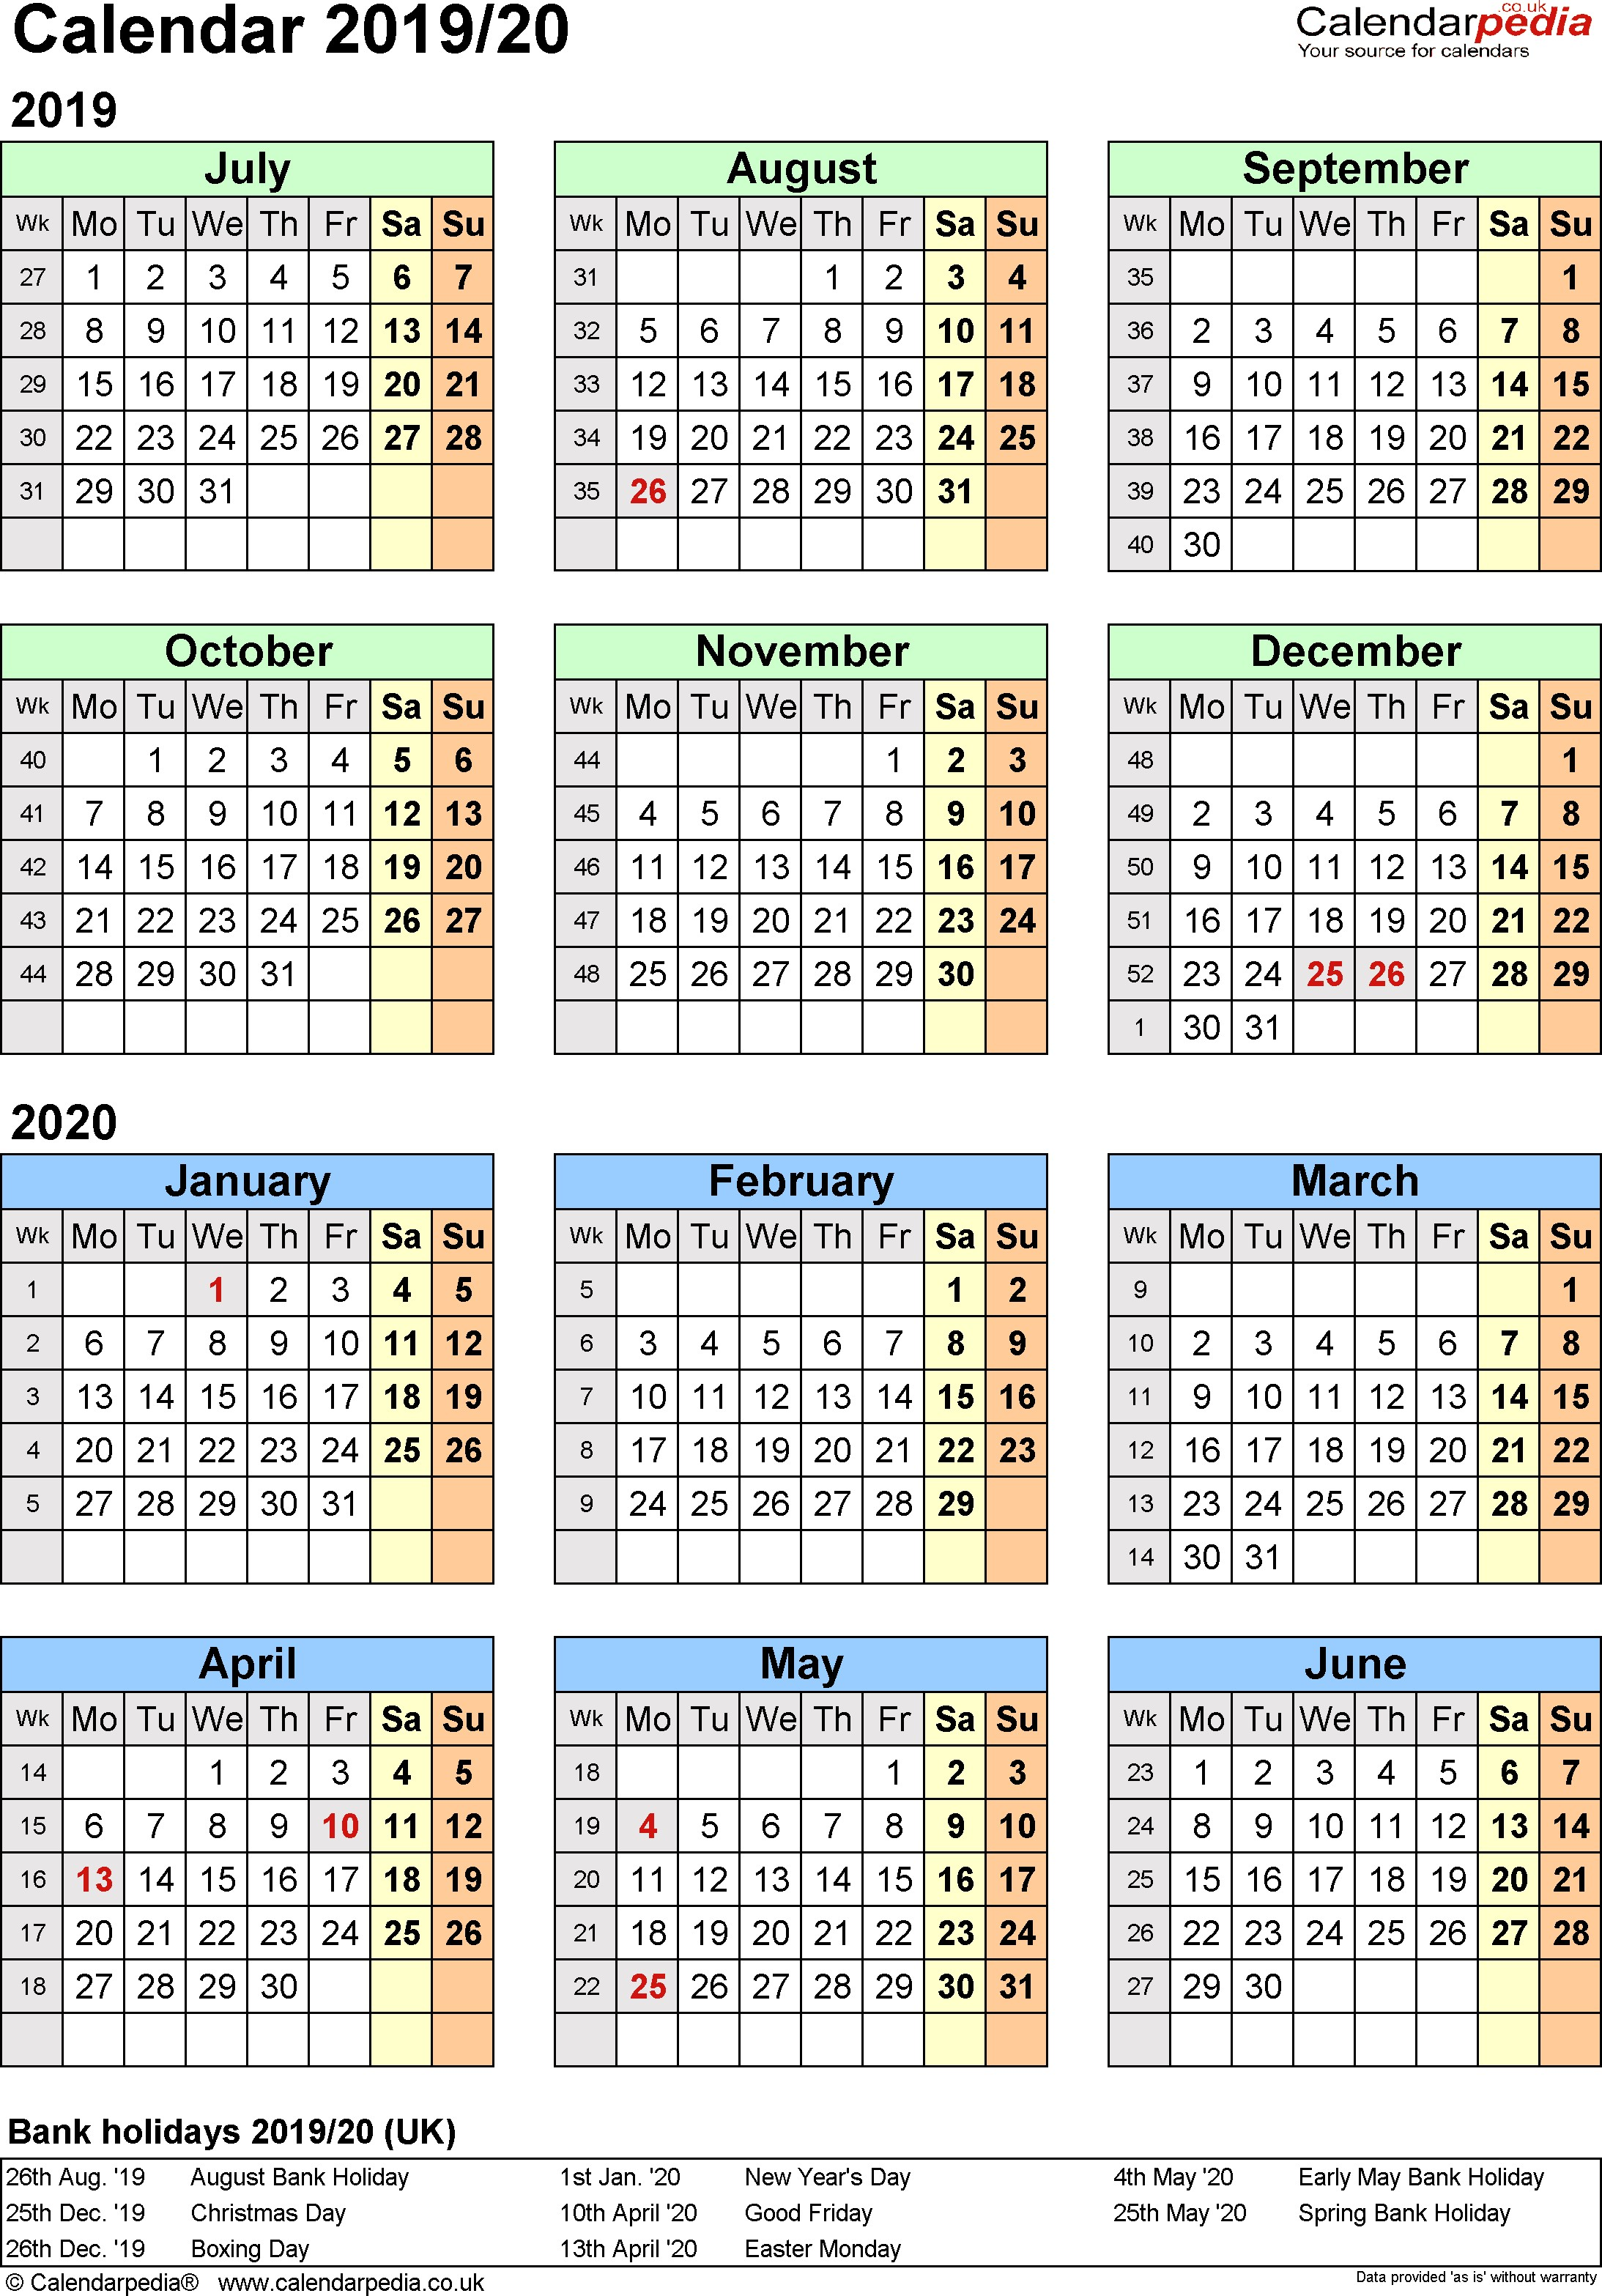 template 2 excel template for split year calendar portrait orientation